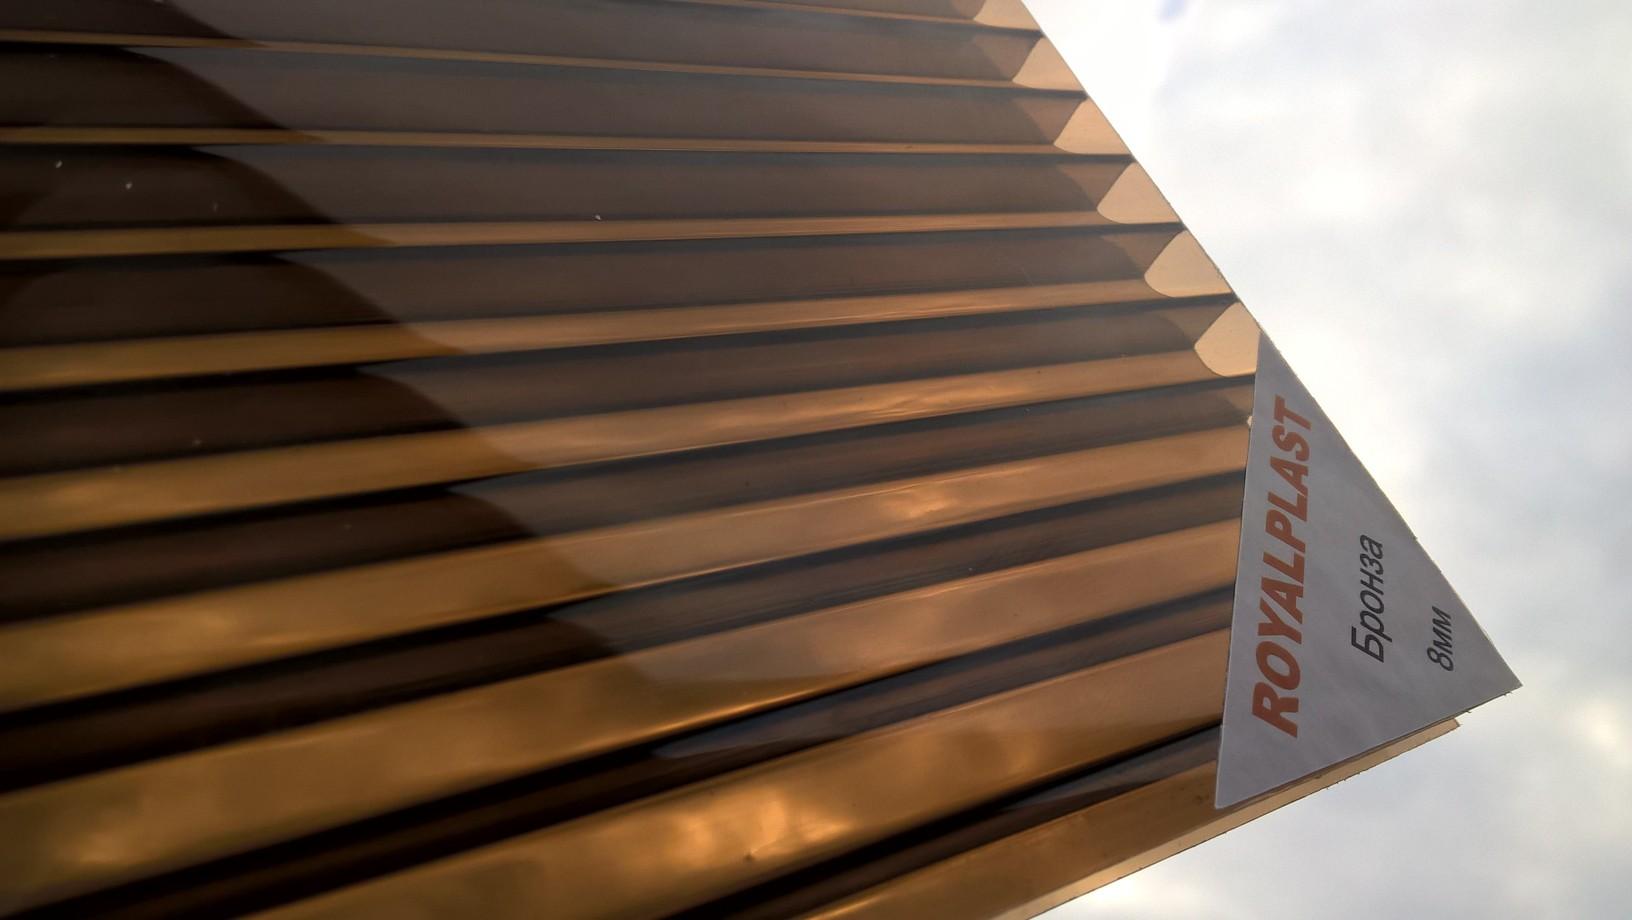 Поликарбонат 10 мм премиум класс бронза